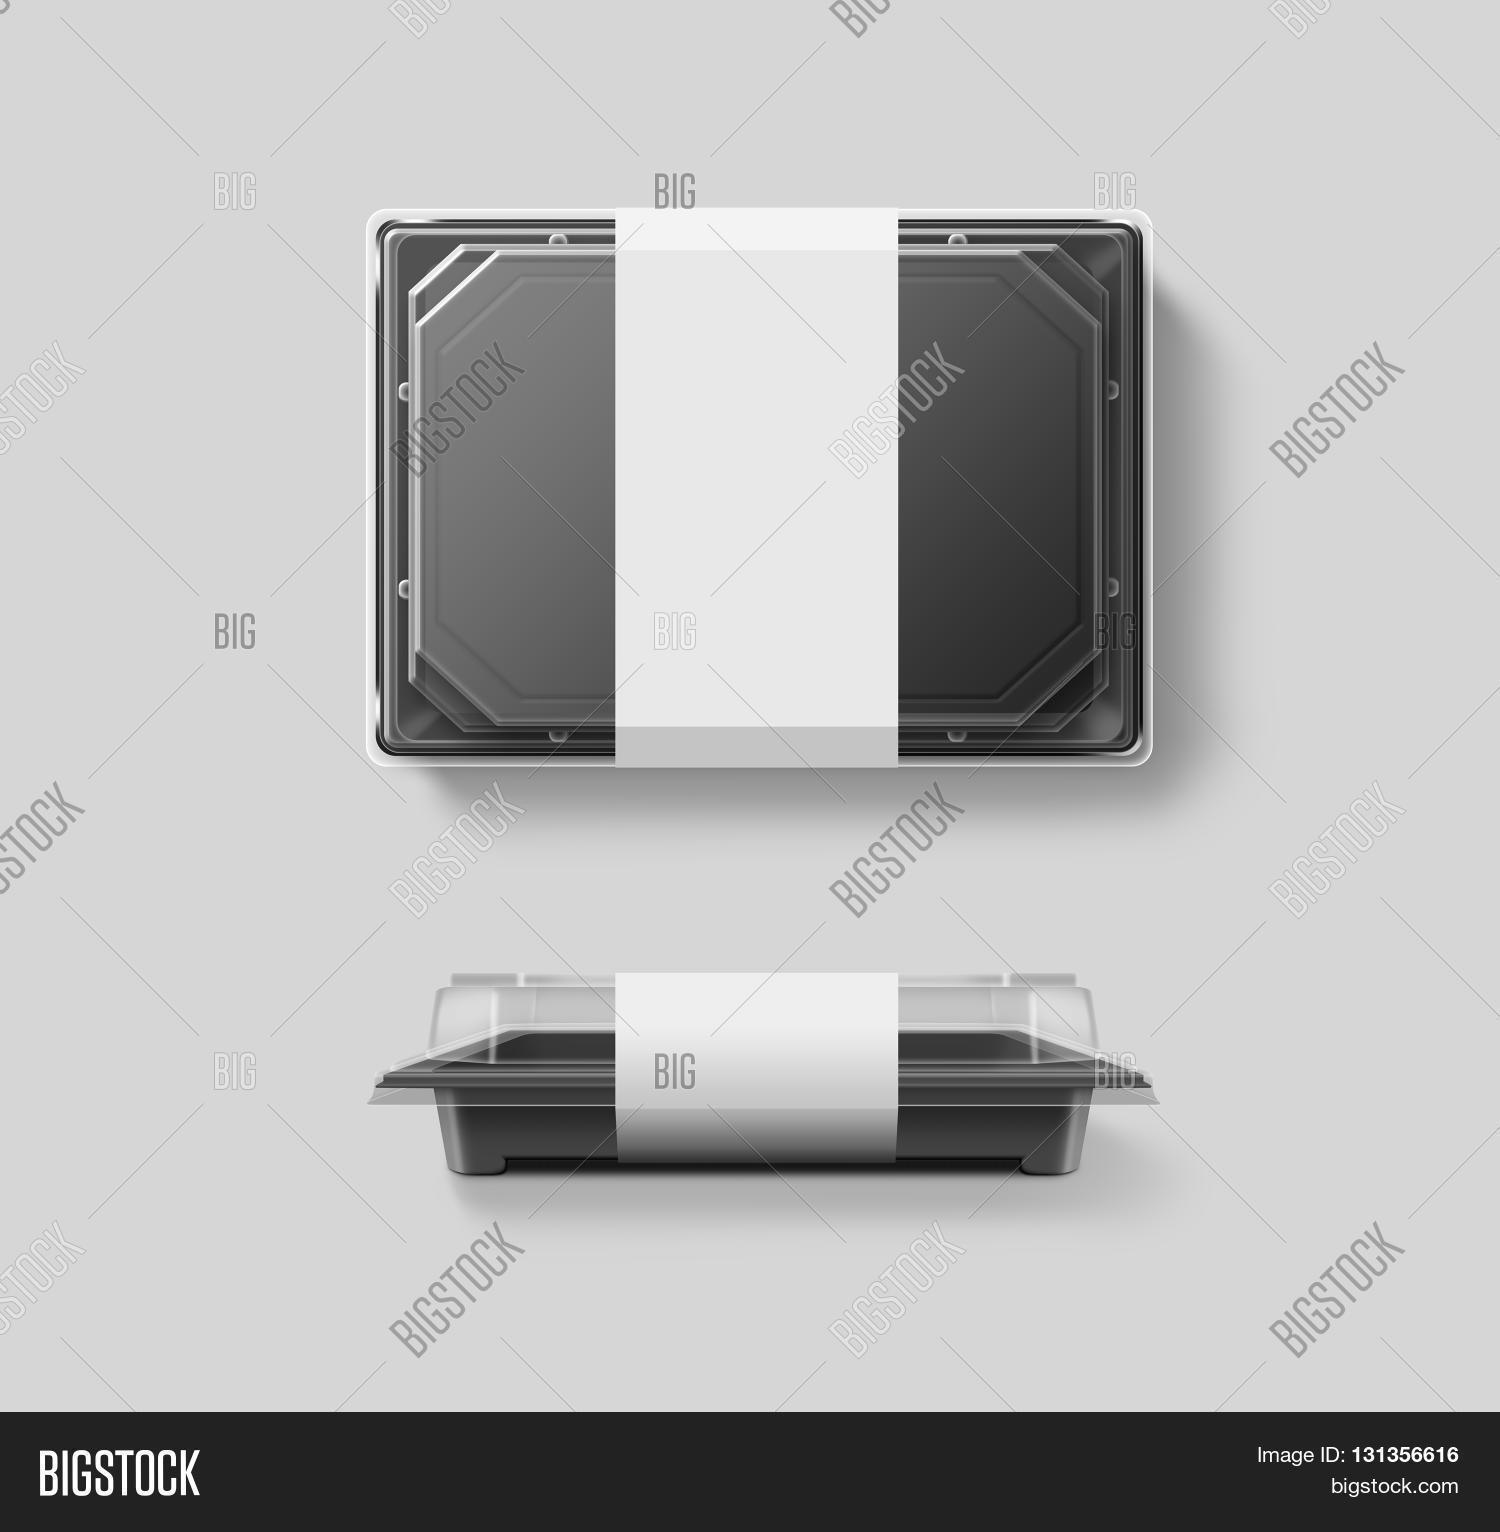 Blank Plastic Image Photo Free Trial Bigstock